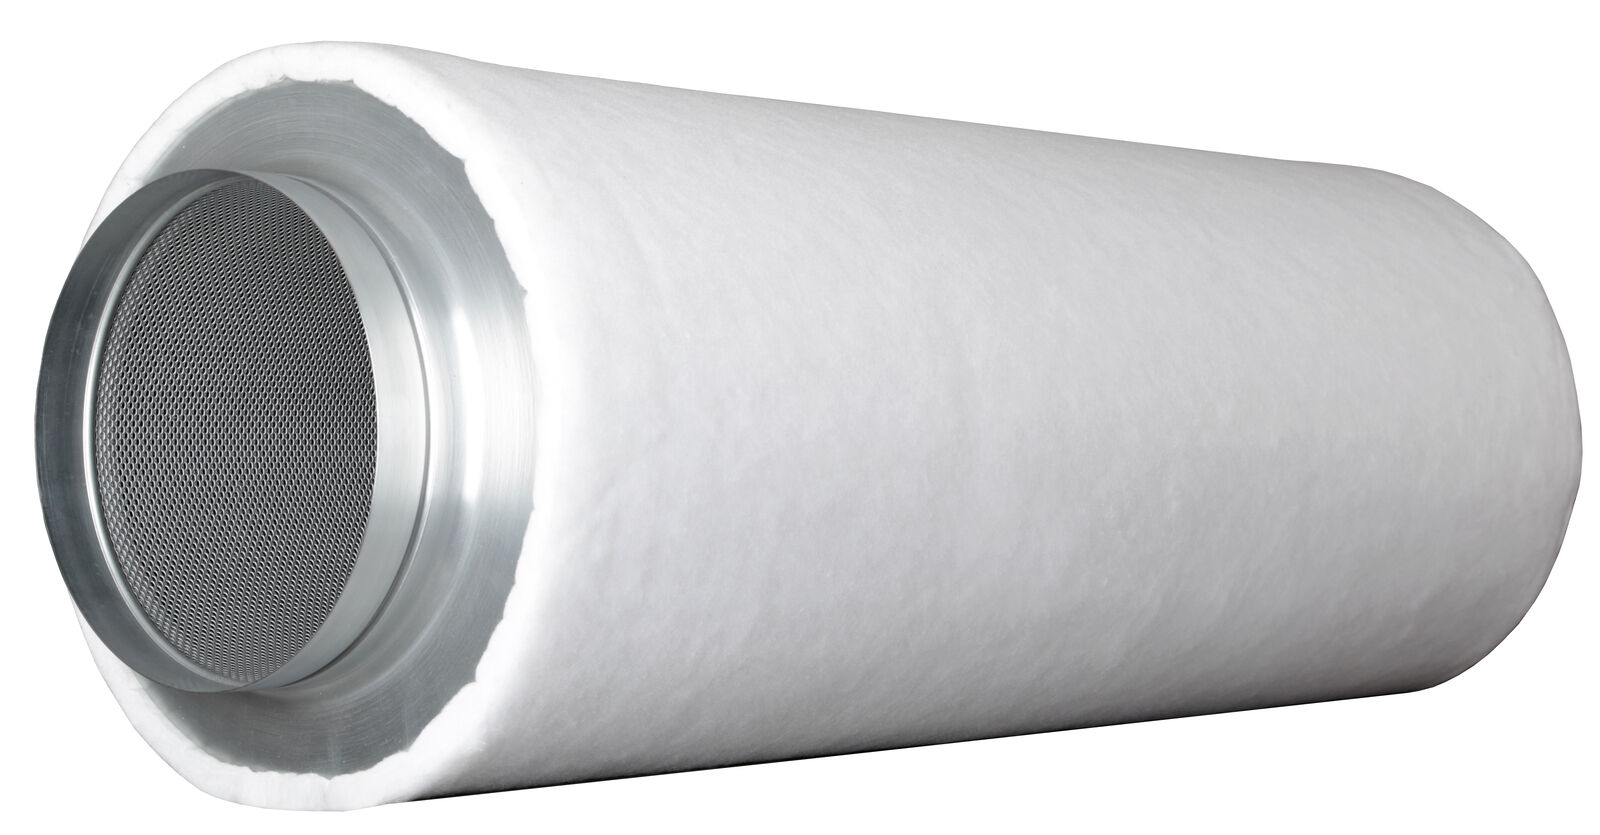 Dttimamente clima Industry LINE CARBONE ATTIVO FILTRO 1150m3 1650m3 200mm FLANGIA AKF